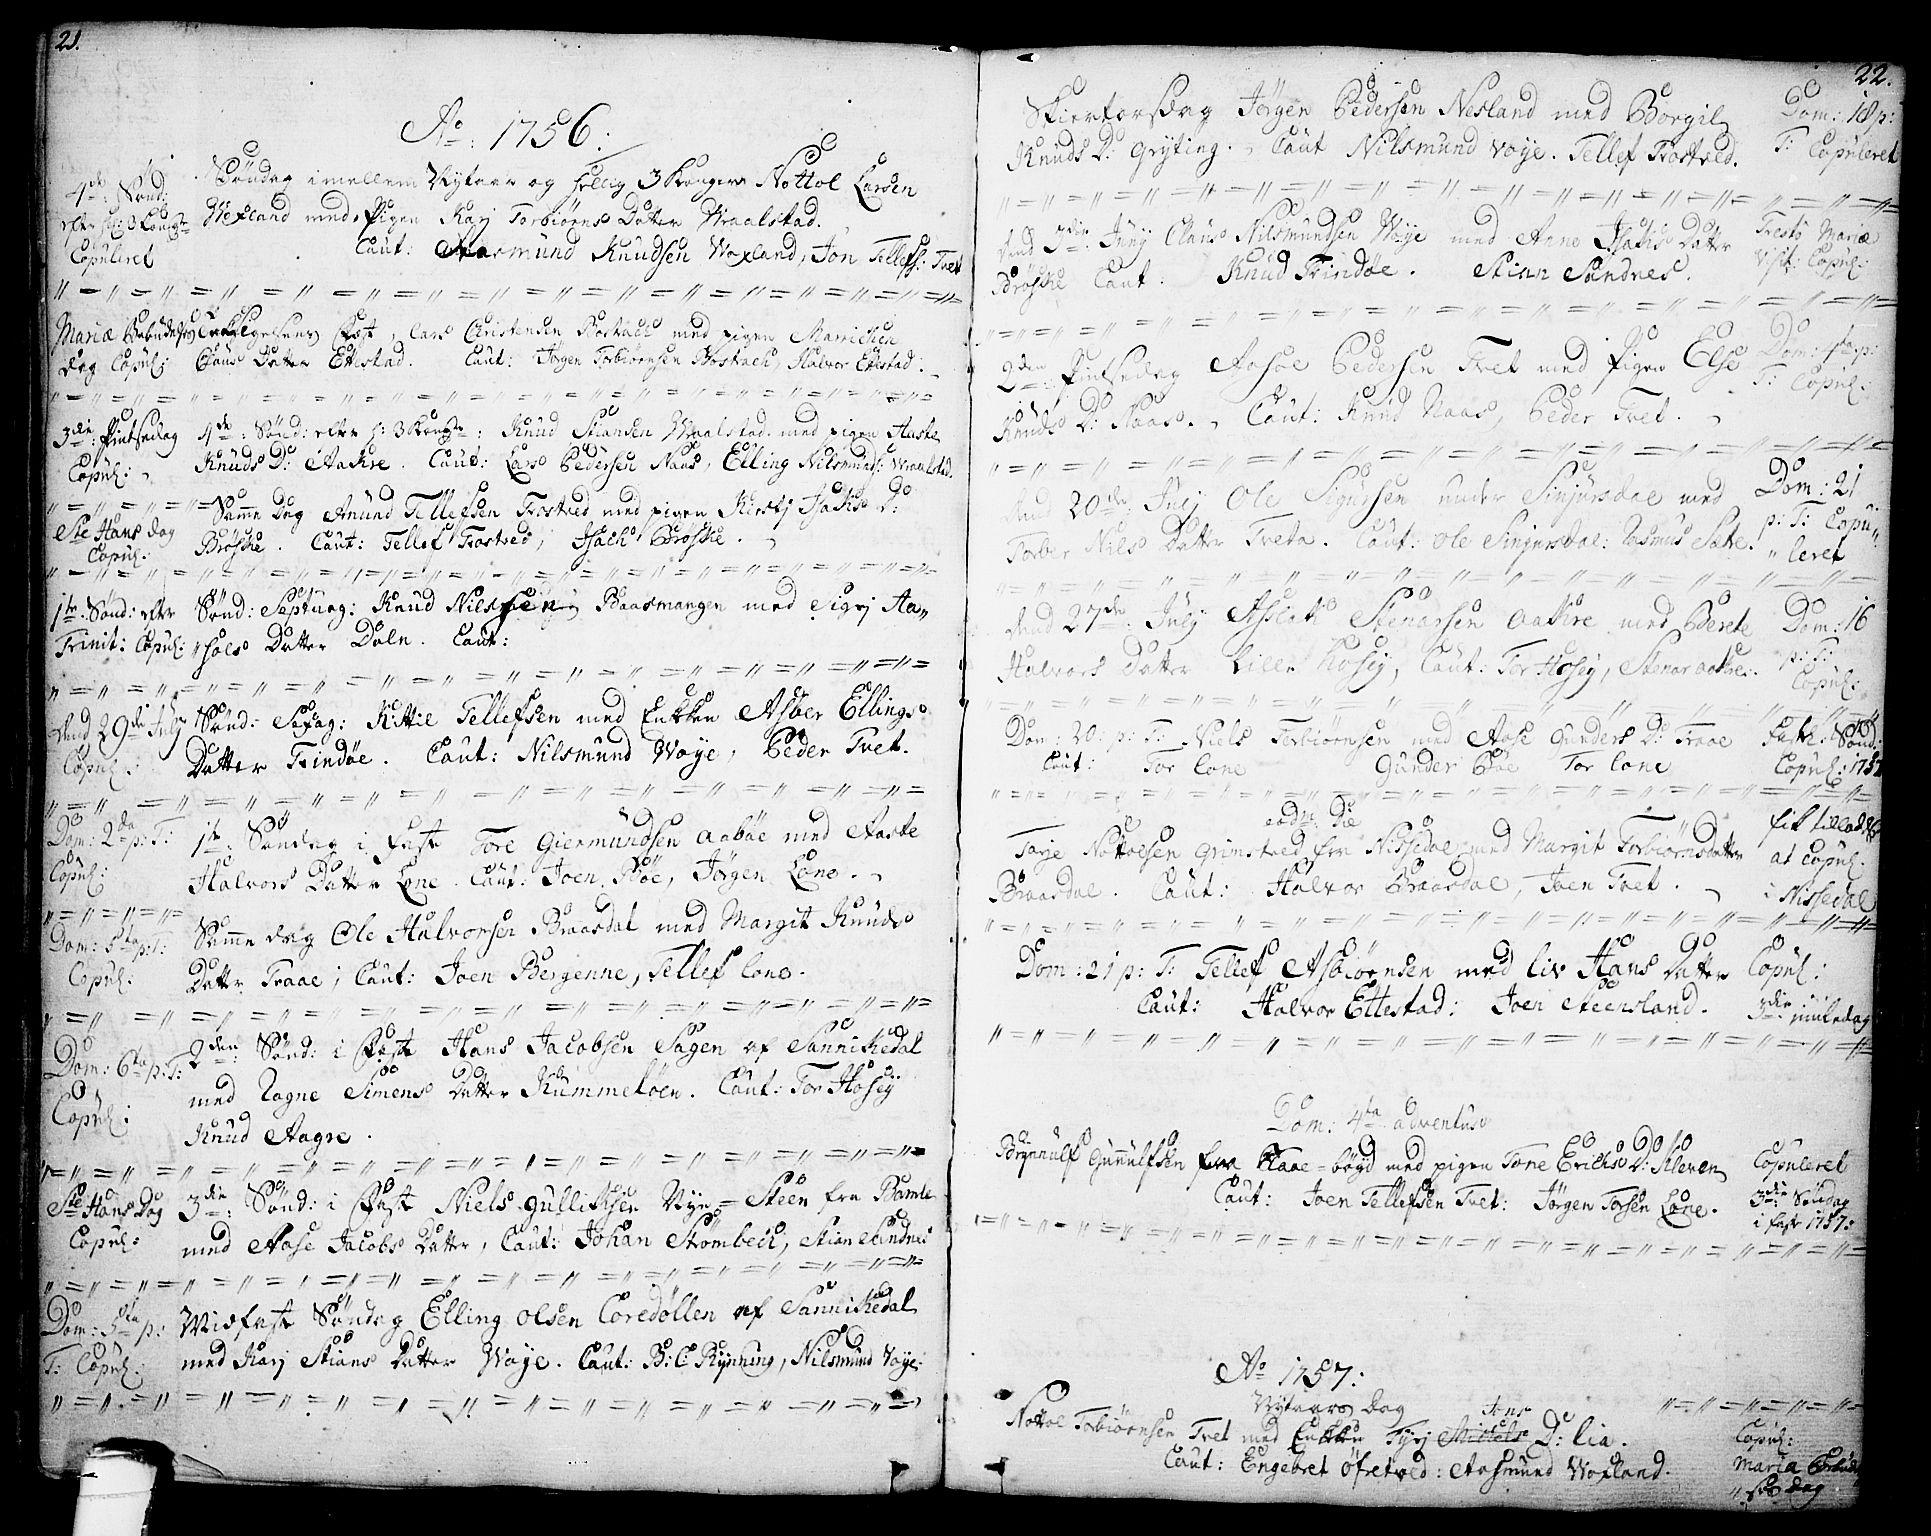 SAKO, Drangedal kirkebøker, F/Fa/L0001: Ministerialbok nr. 1, 1697-1767, s. 21-22